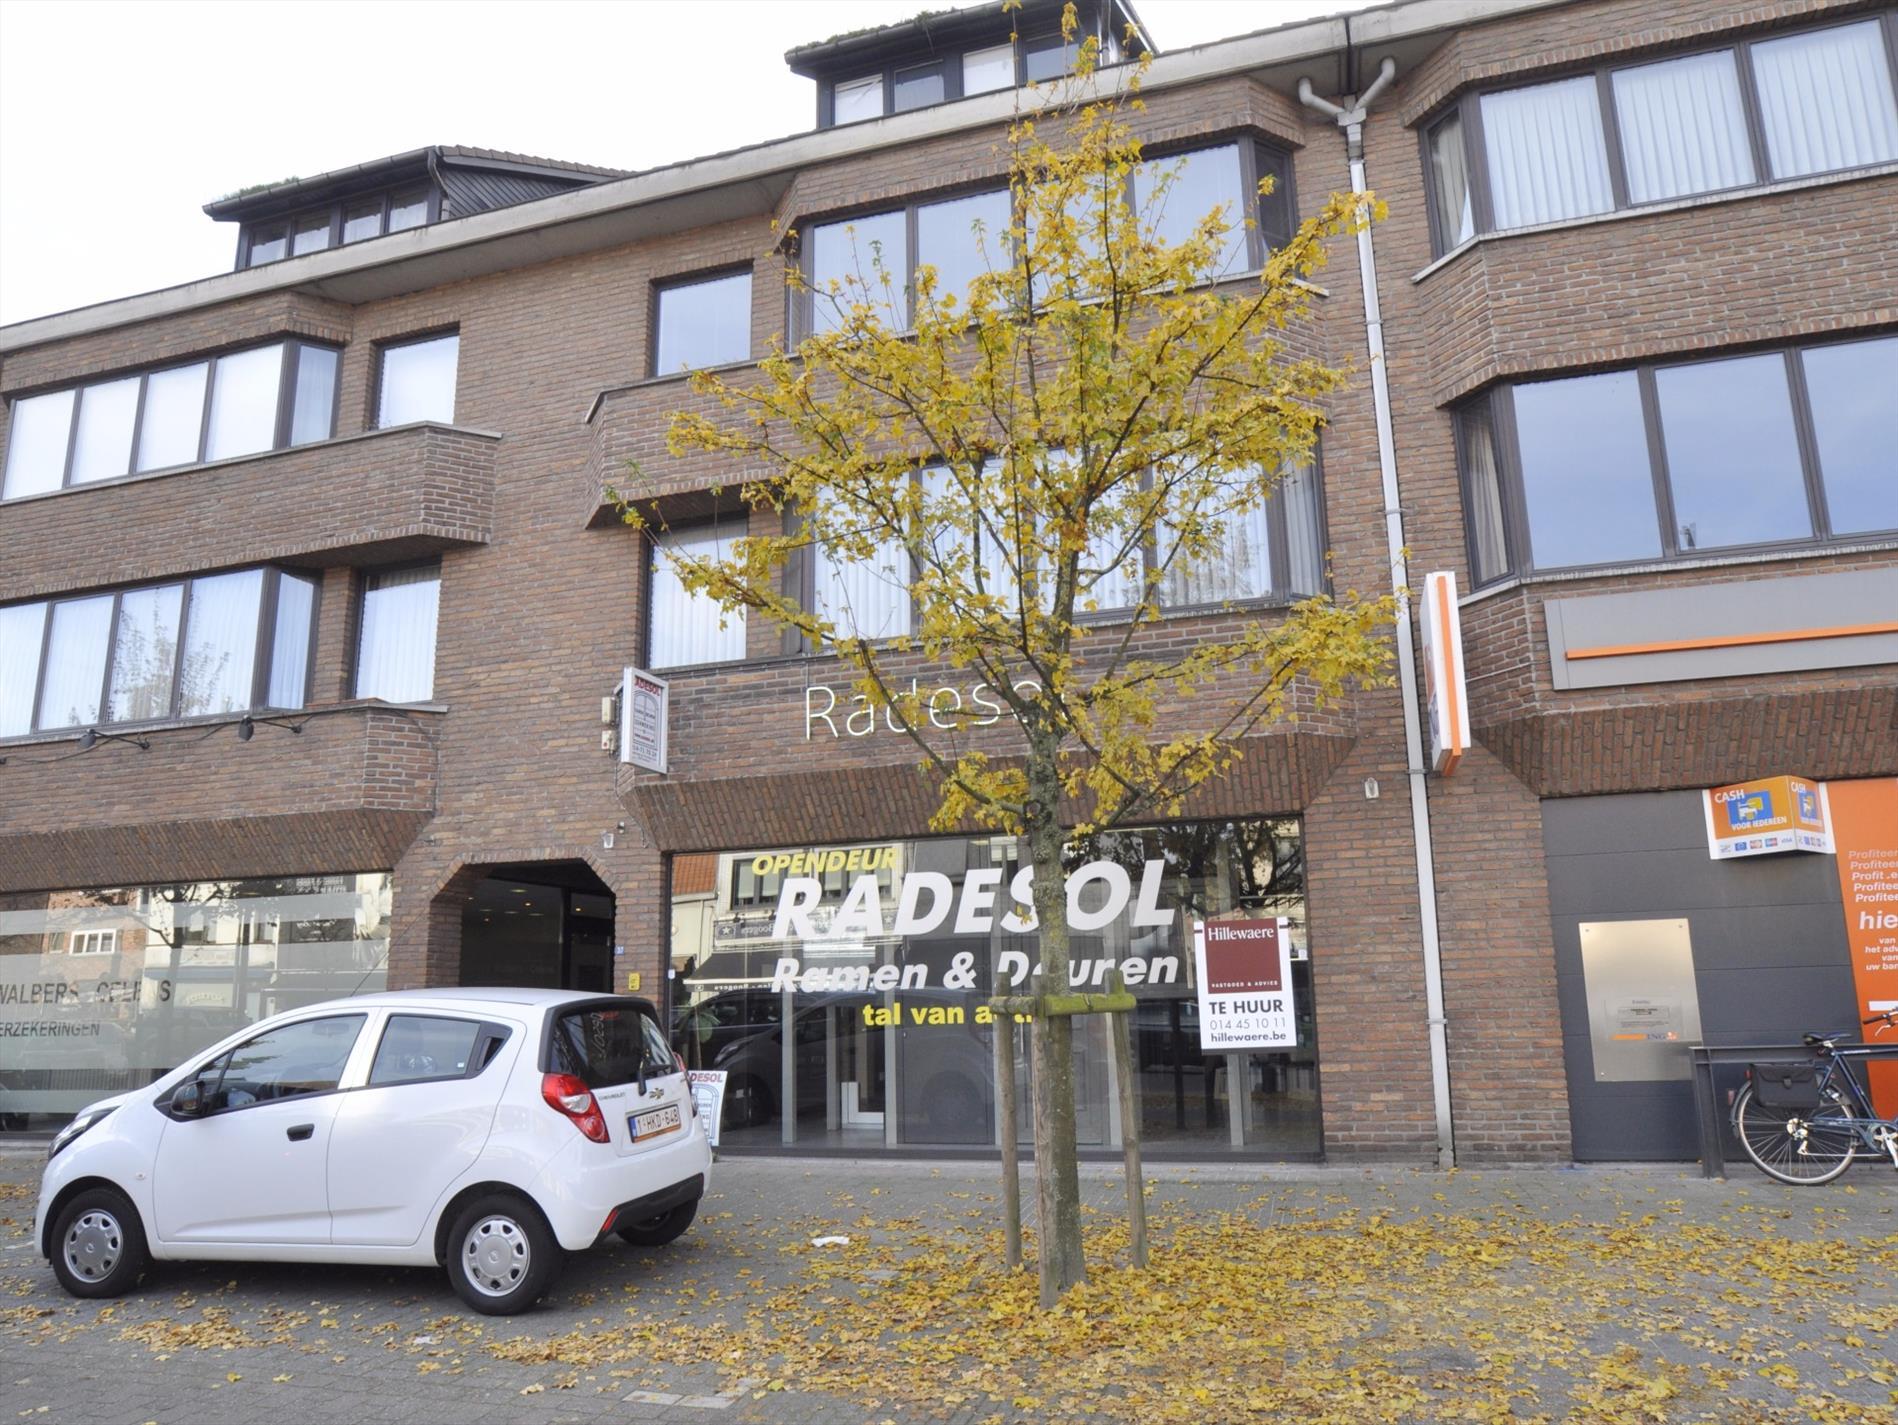 065566ba3a9 Handelsruimte ca. 100m² met appartement te Oud-Turnhout